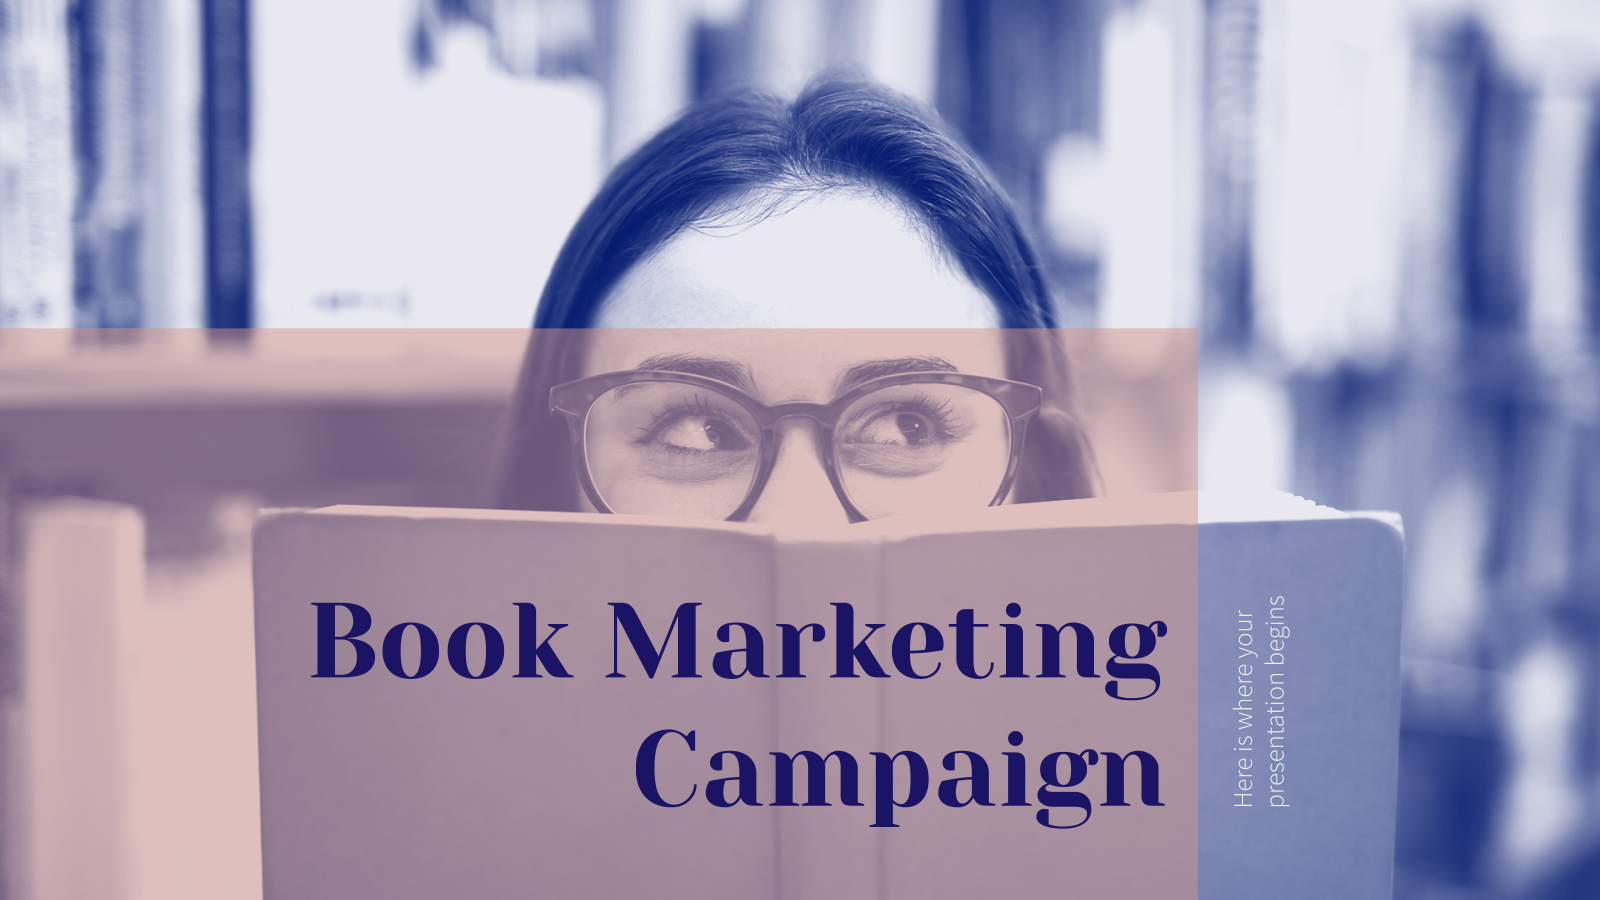 Plantilla de presentación Campaña de marketing para libros